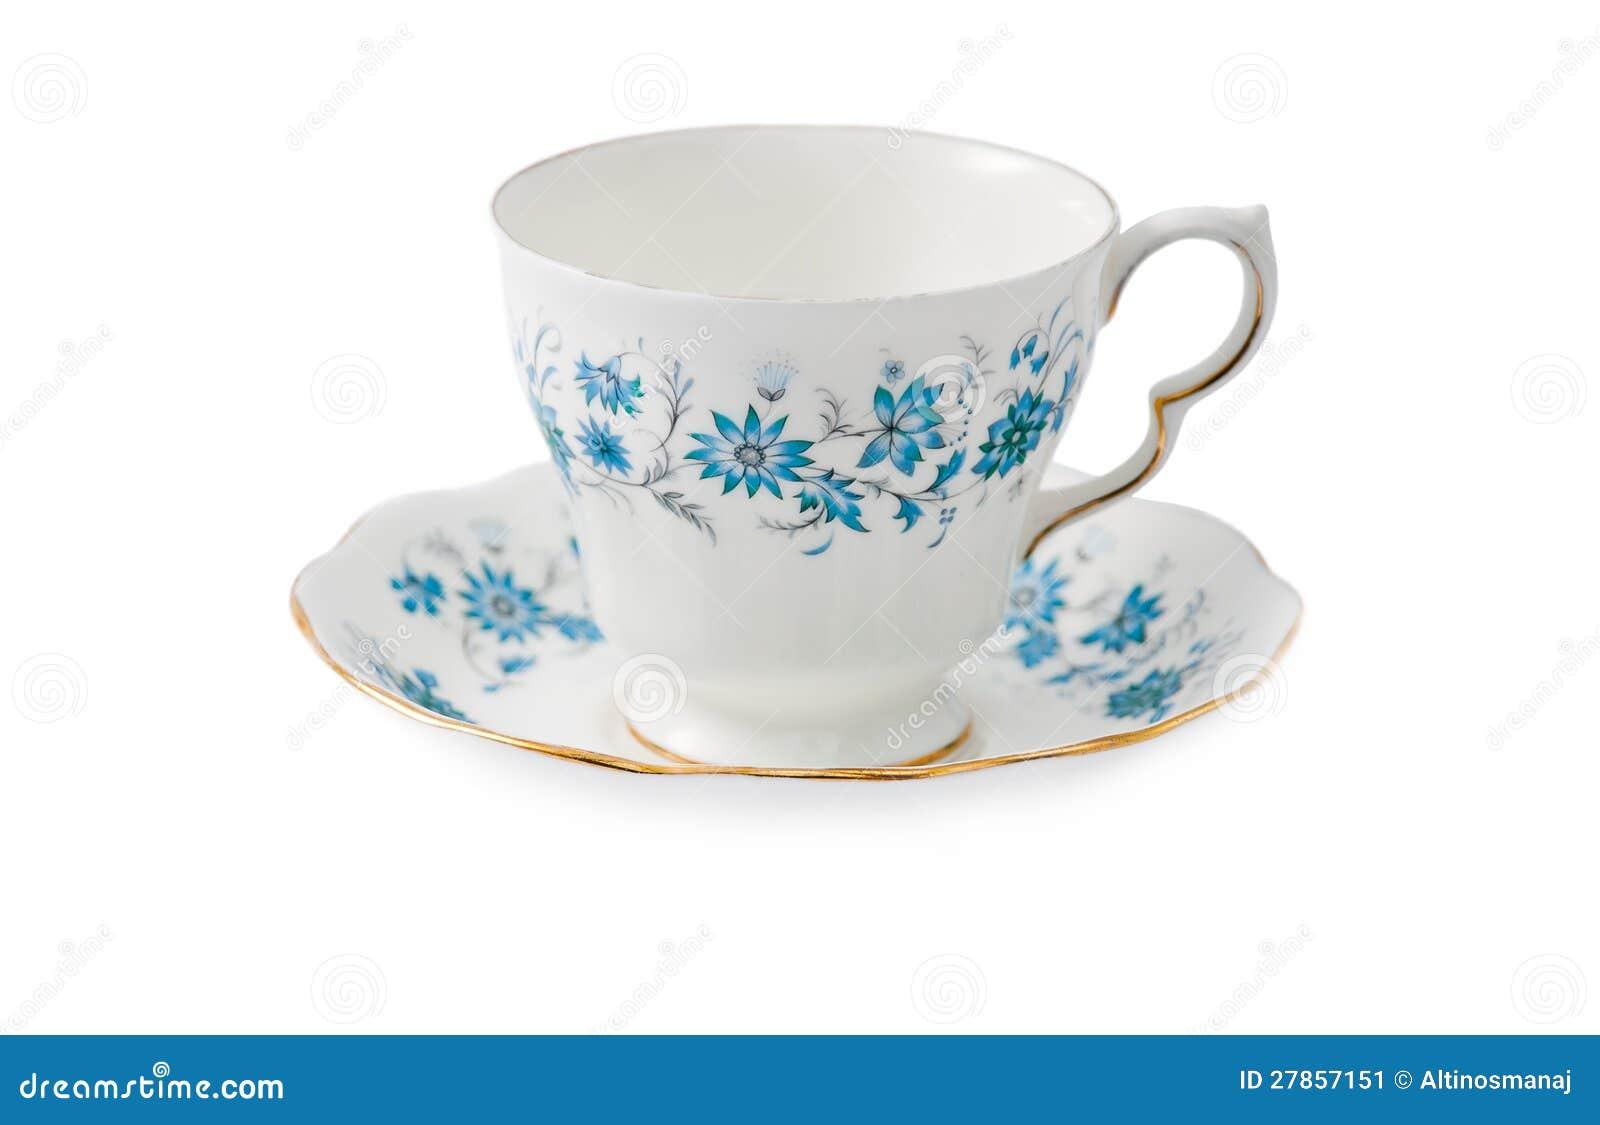 China porcelain tea cup flower design stock image for Cool tea cup designs